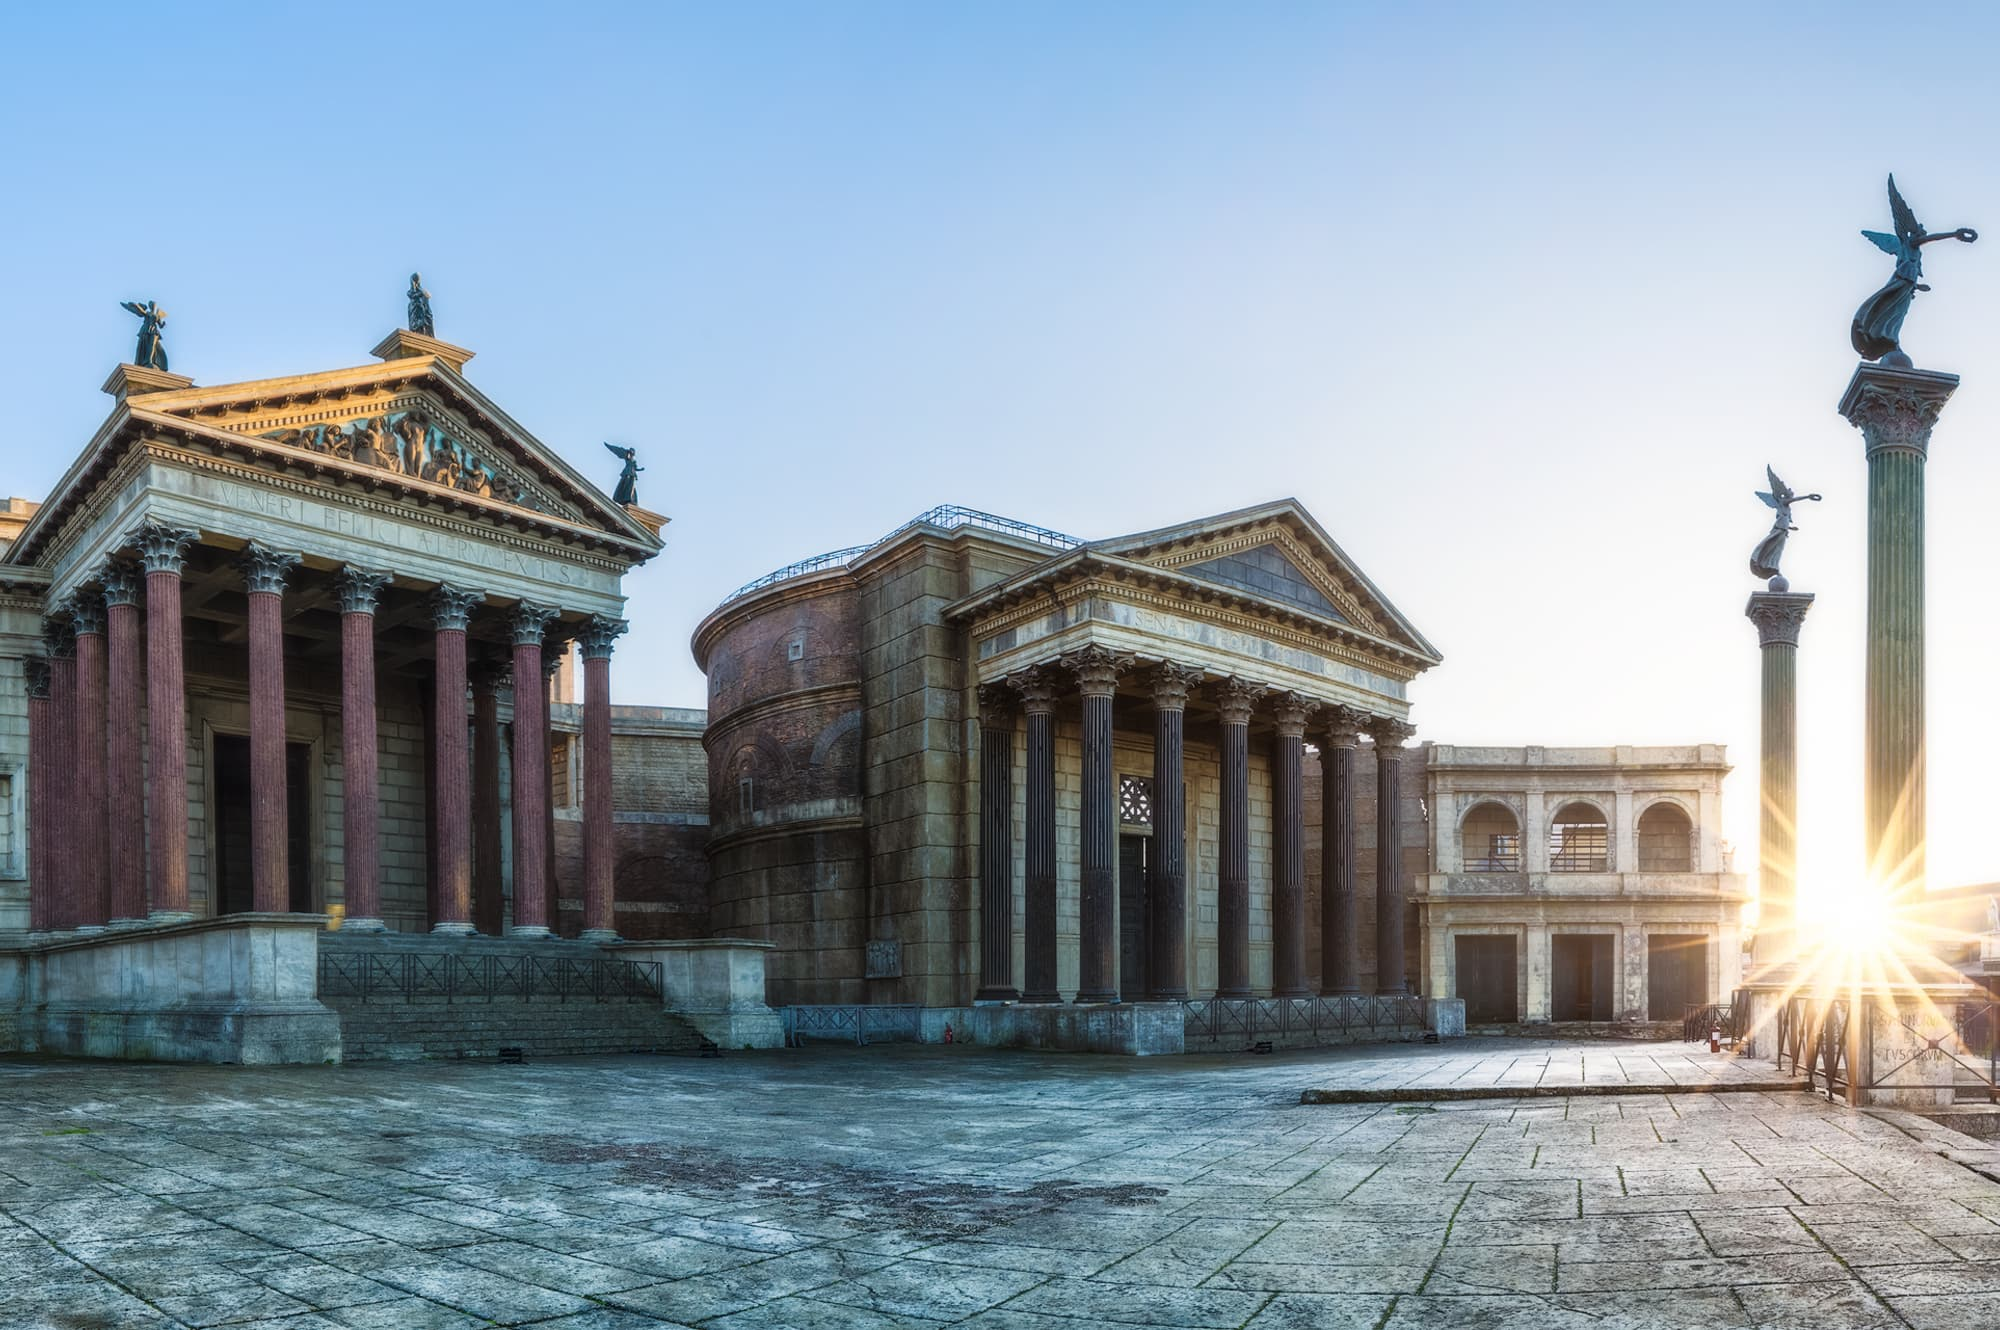 cinecittà- Roma Antica 1